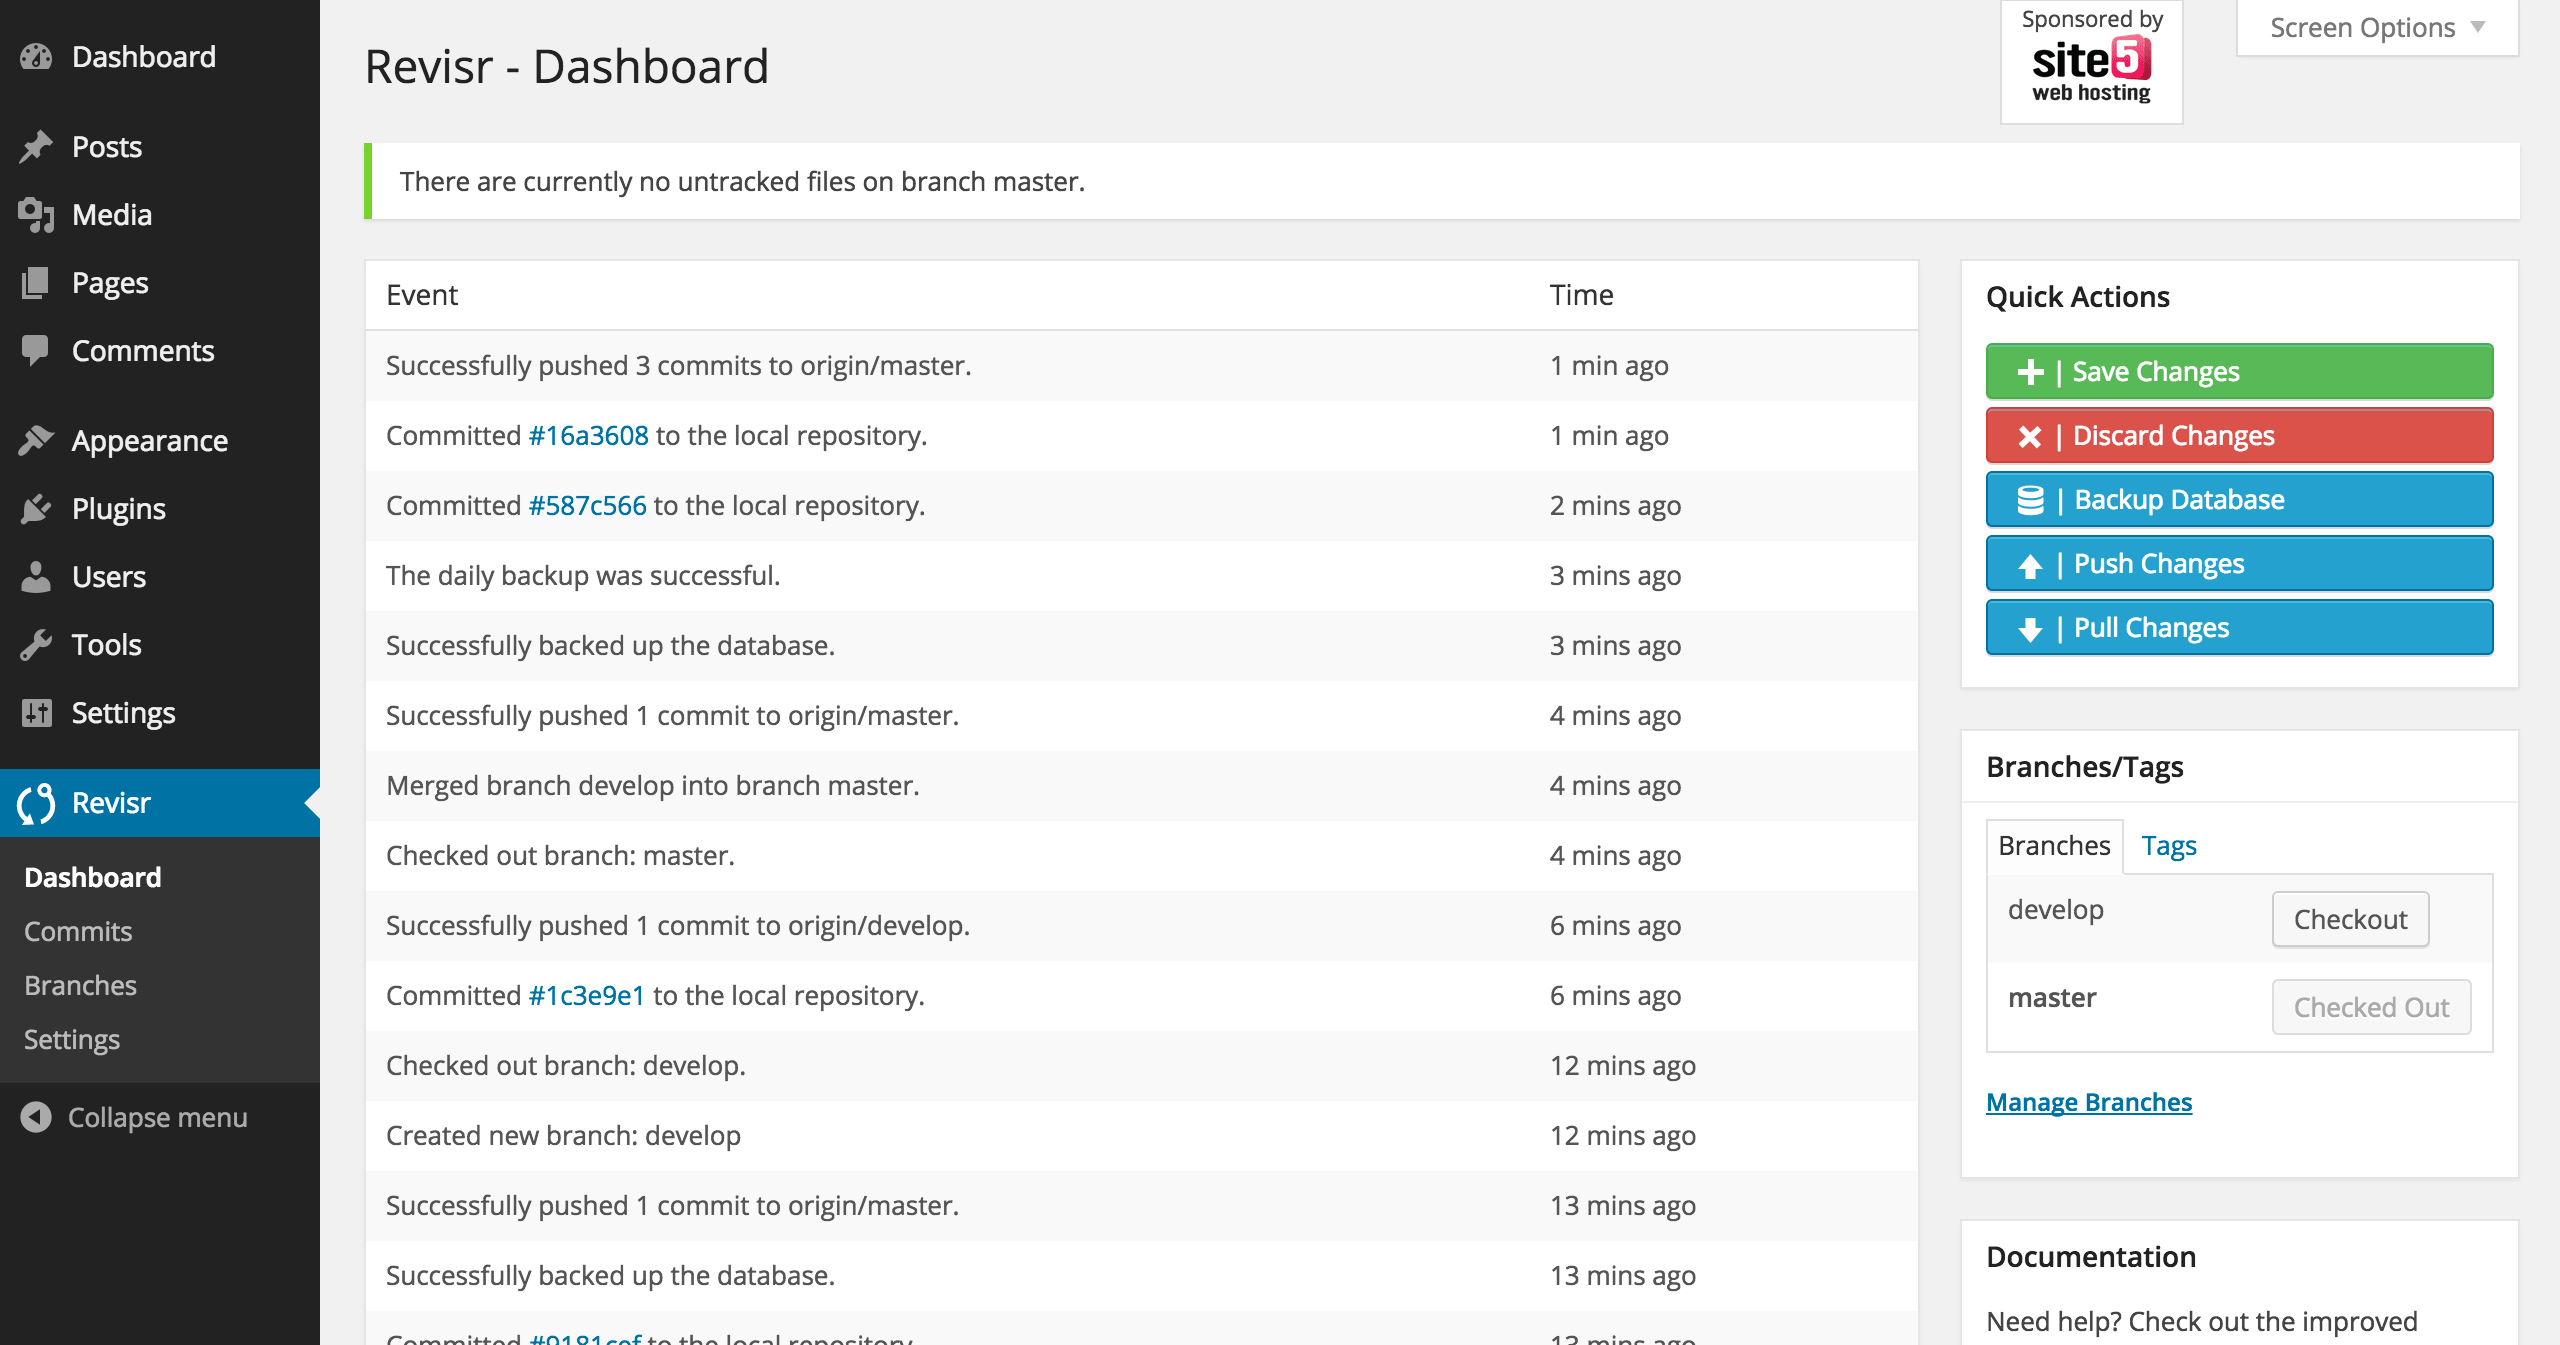 1. The main dashboard of Revisr.